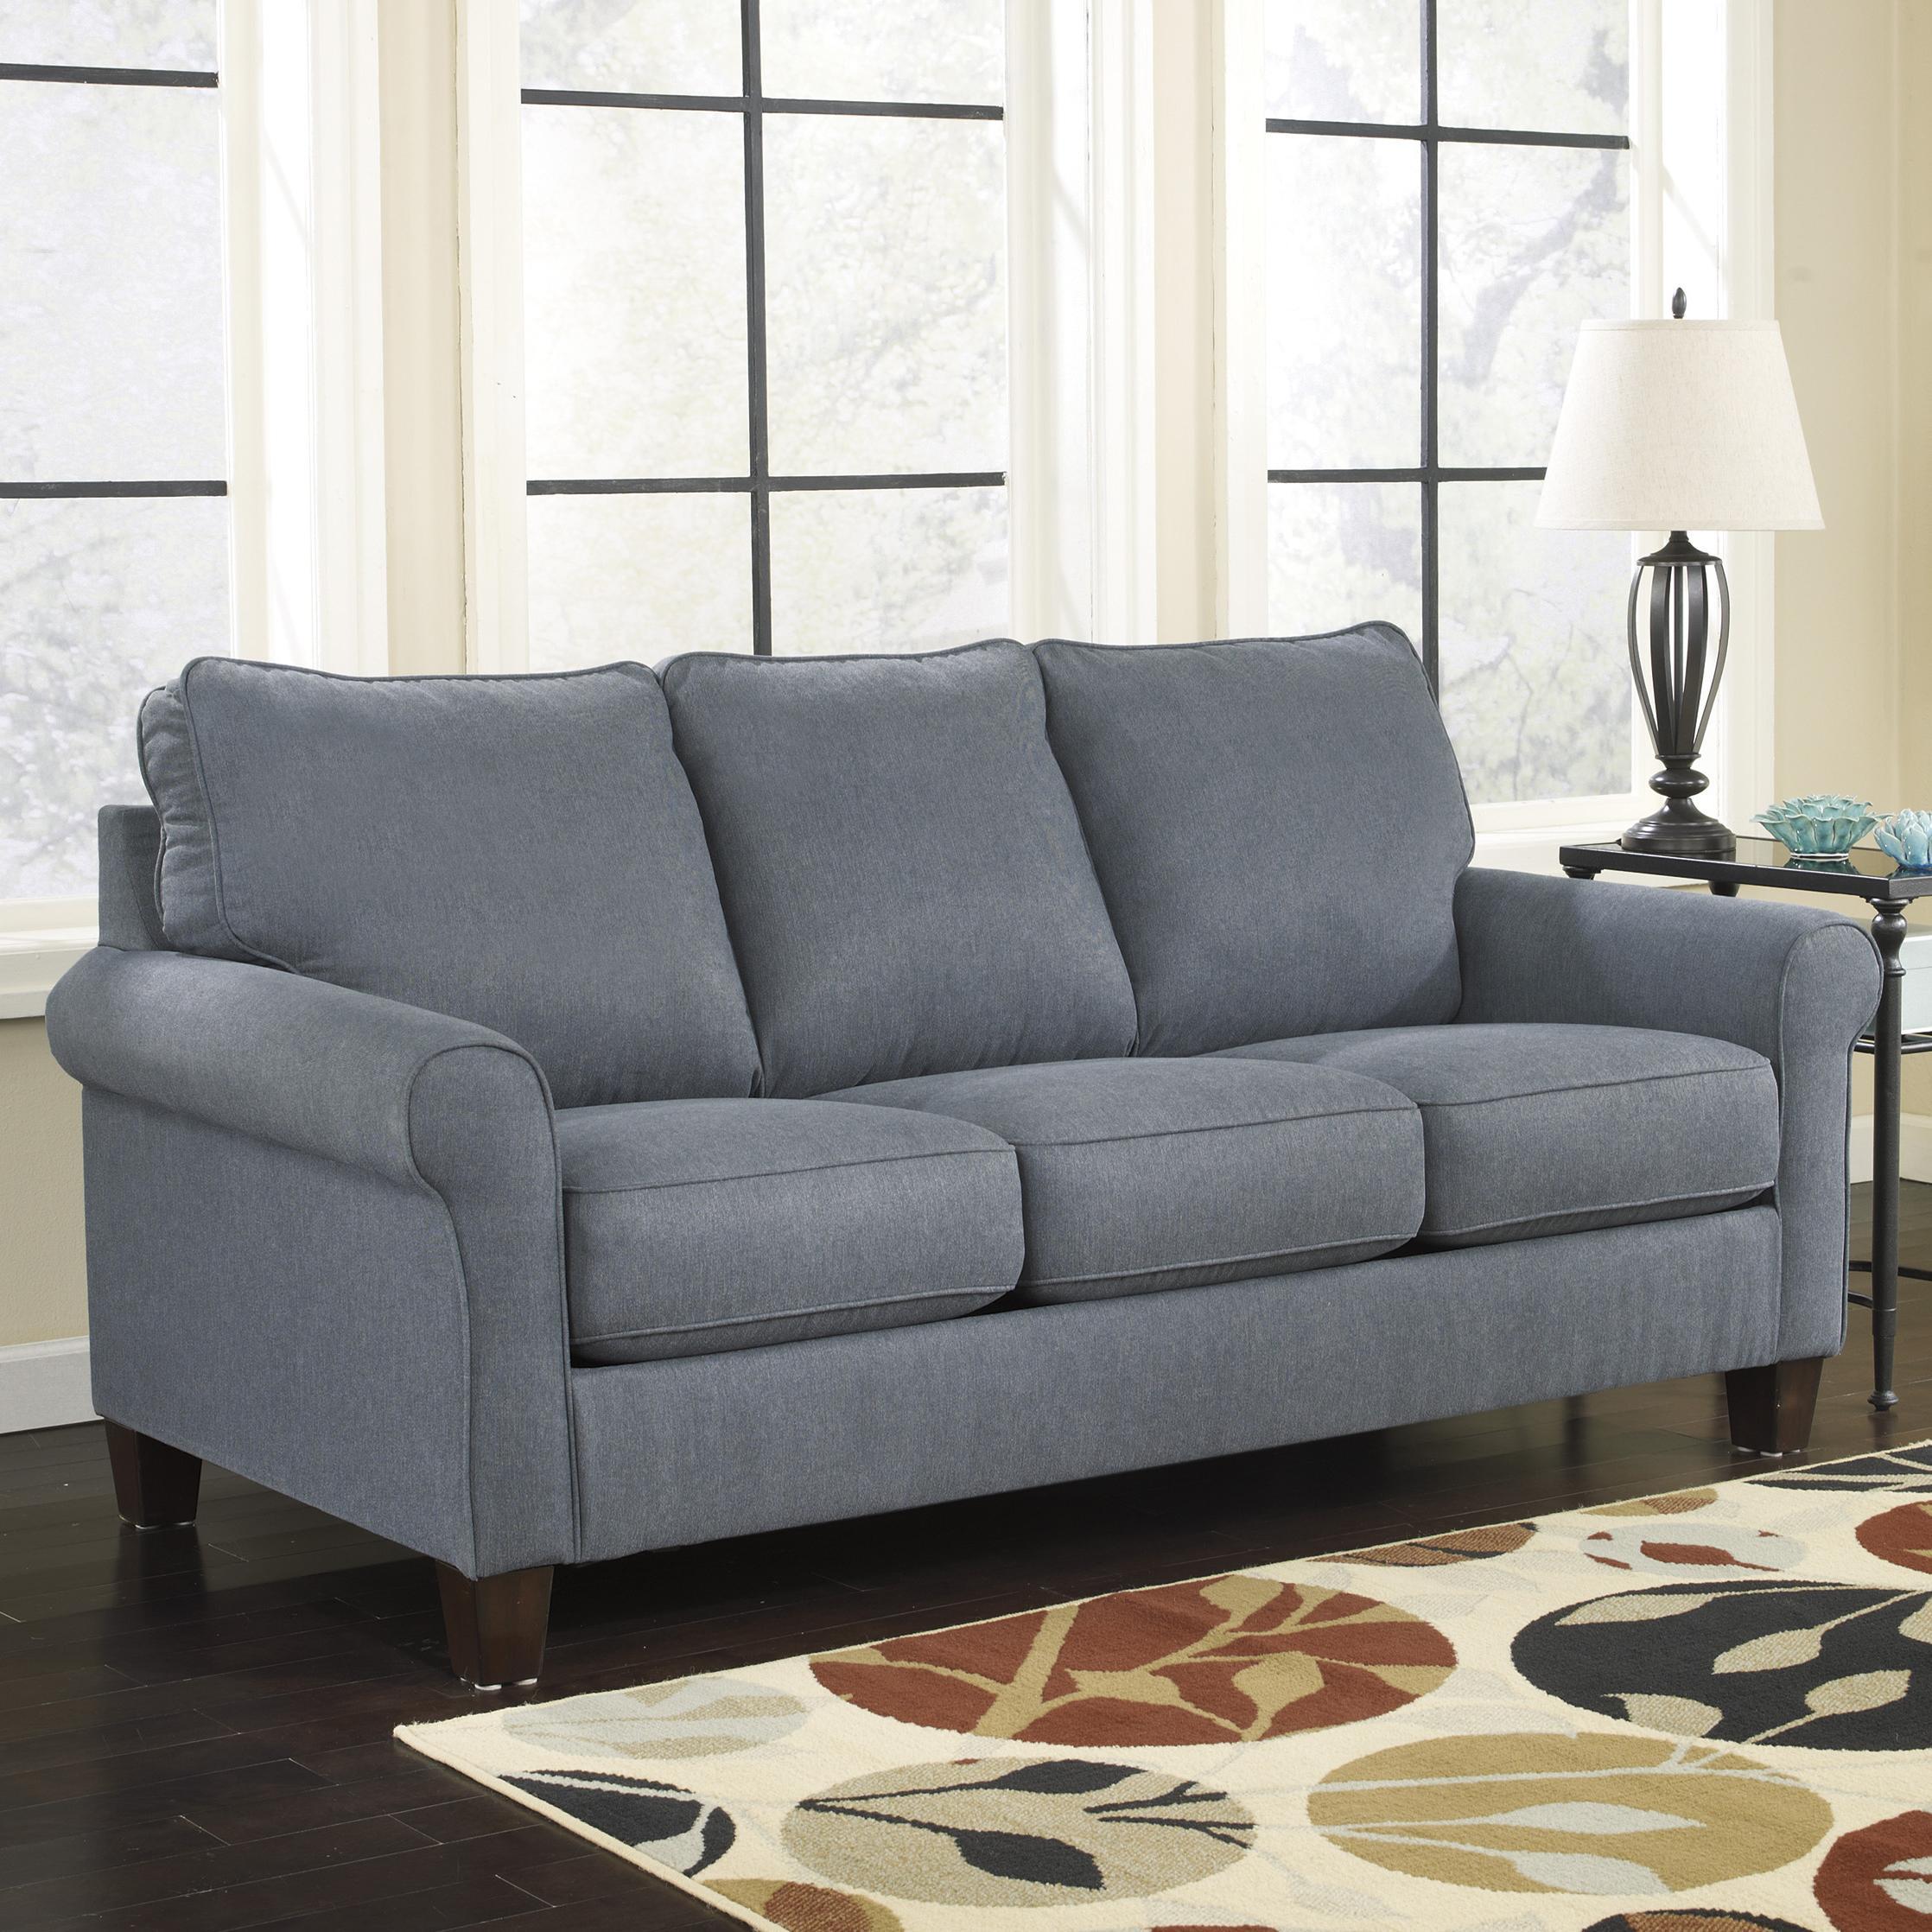 Signature Design By Ashley Zeth Denim 78 Full Sofa